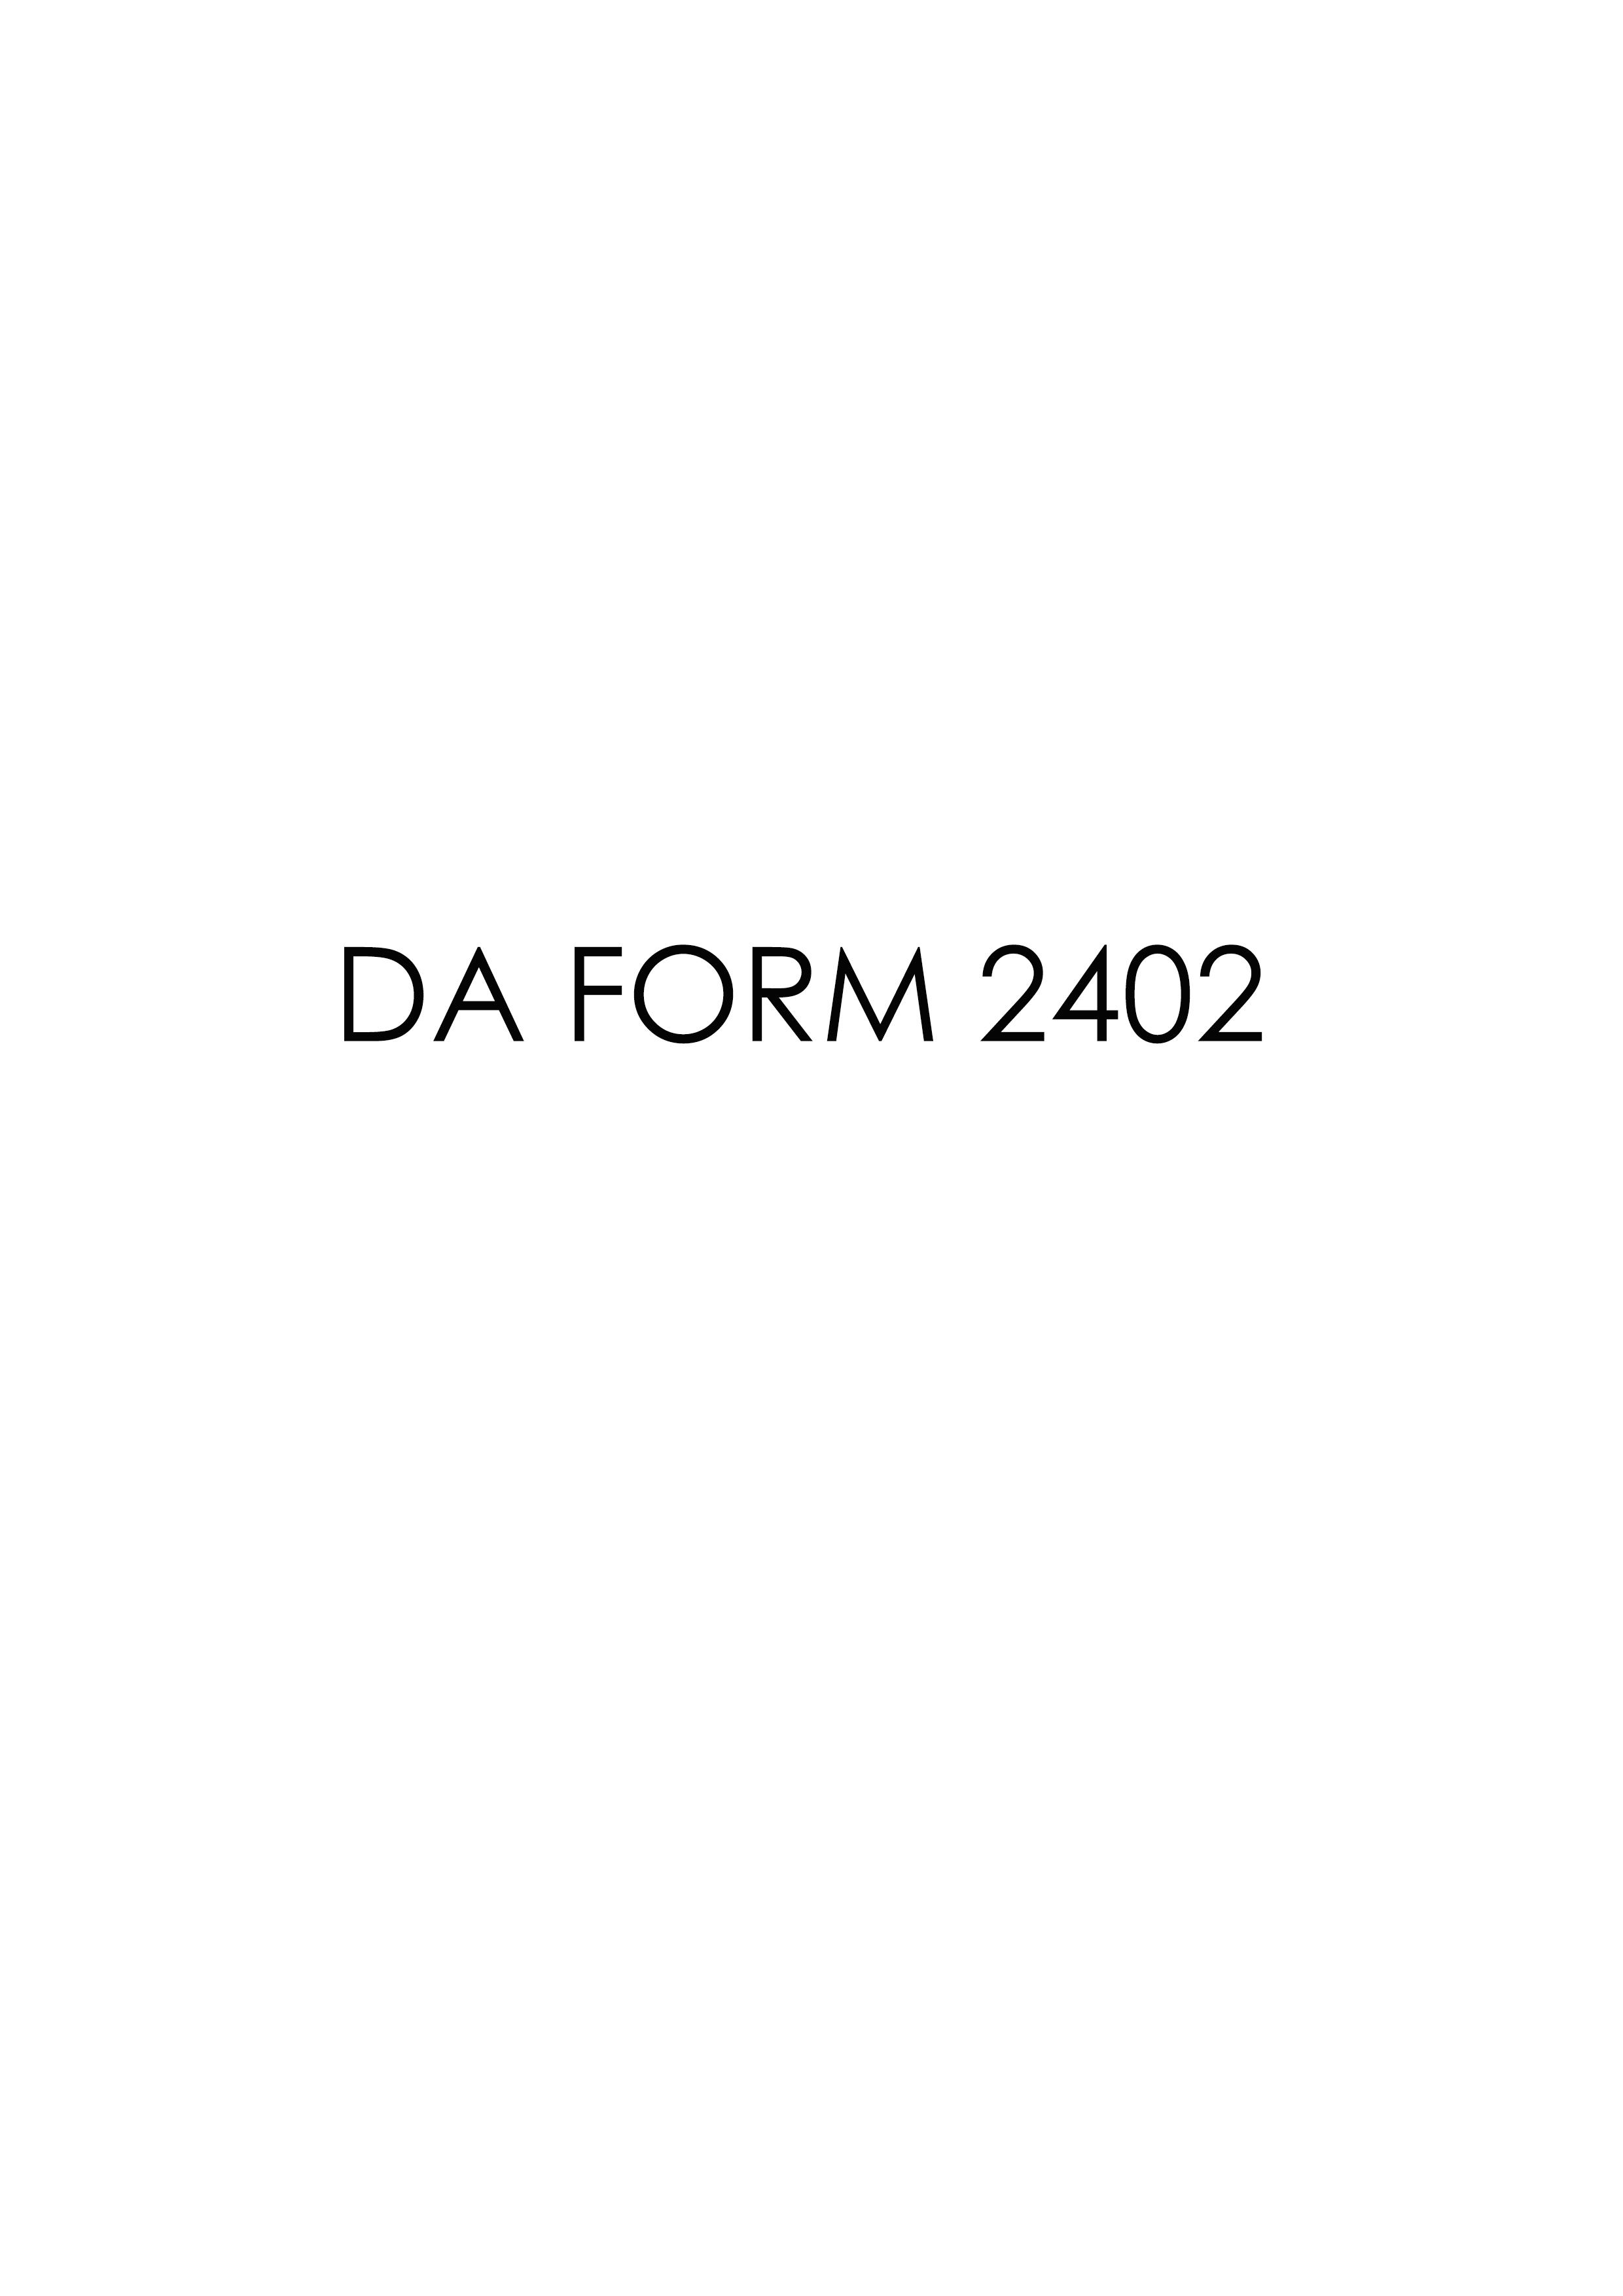 Download da Form 2402 Free